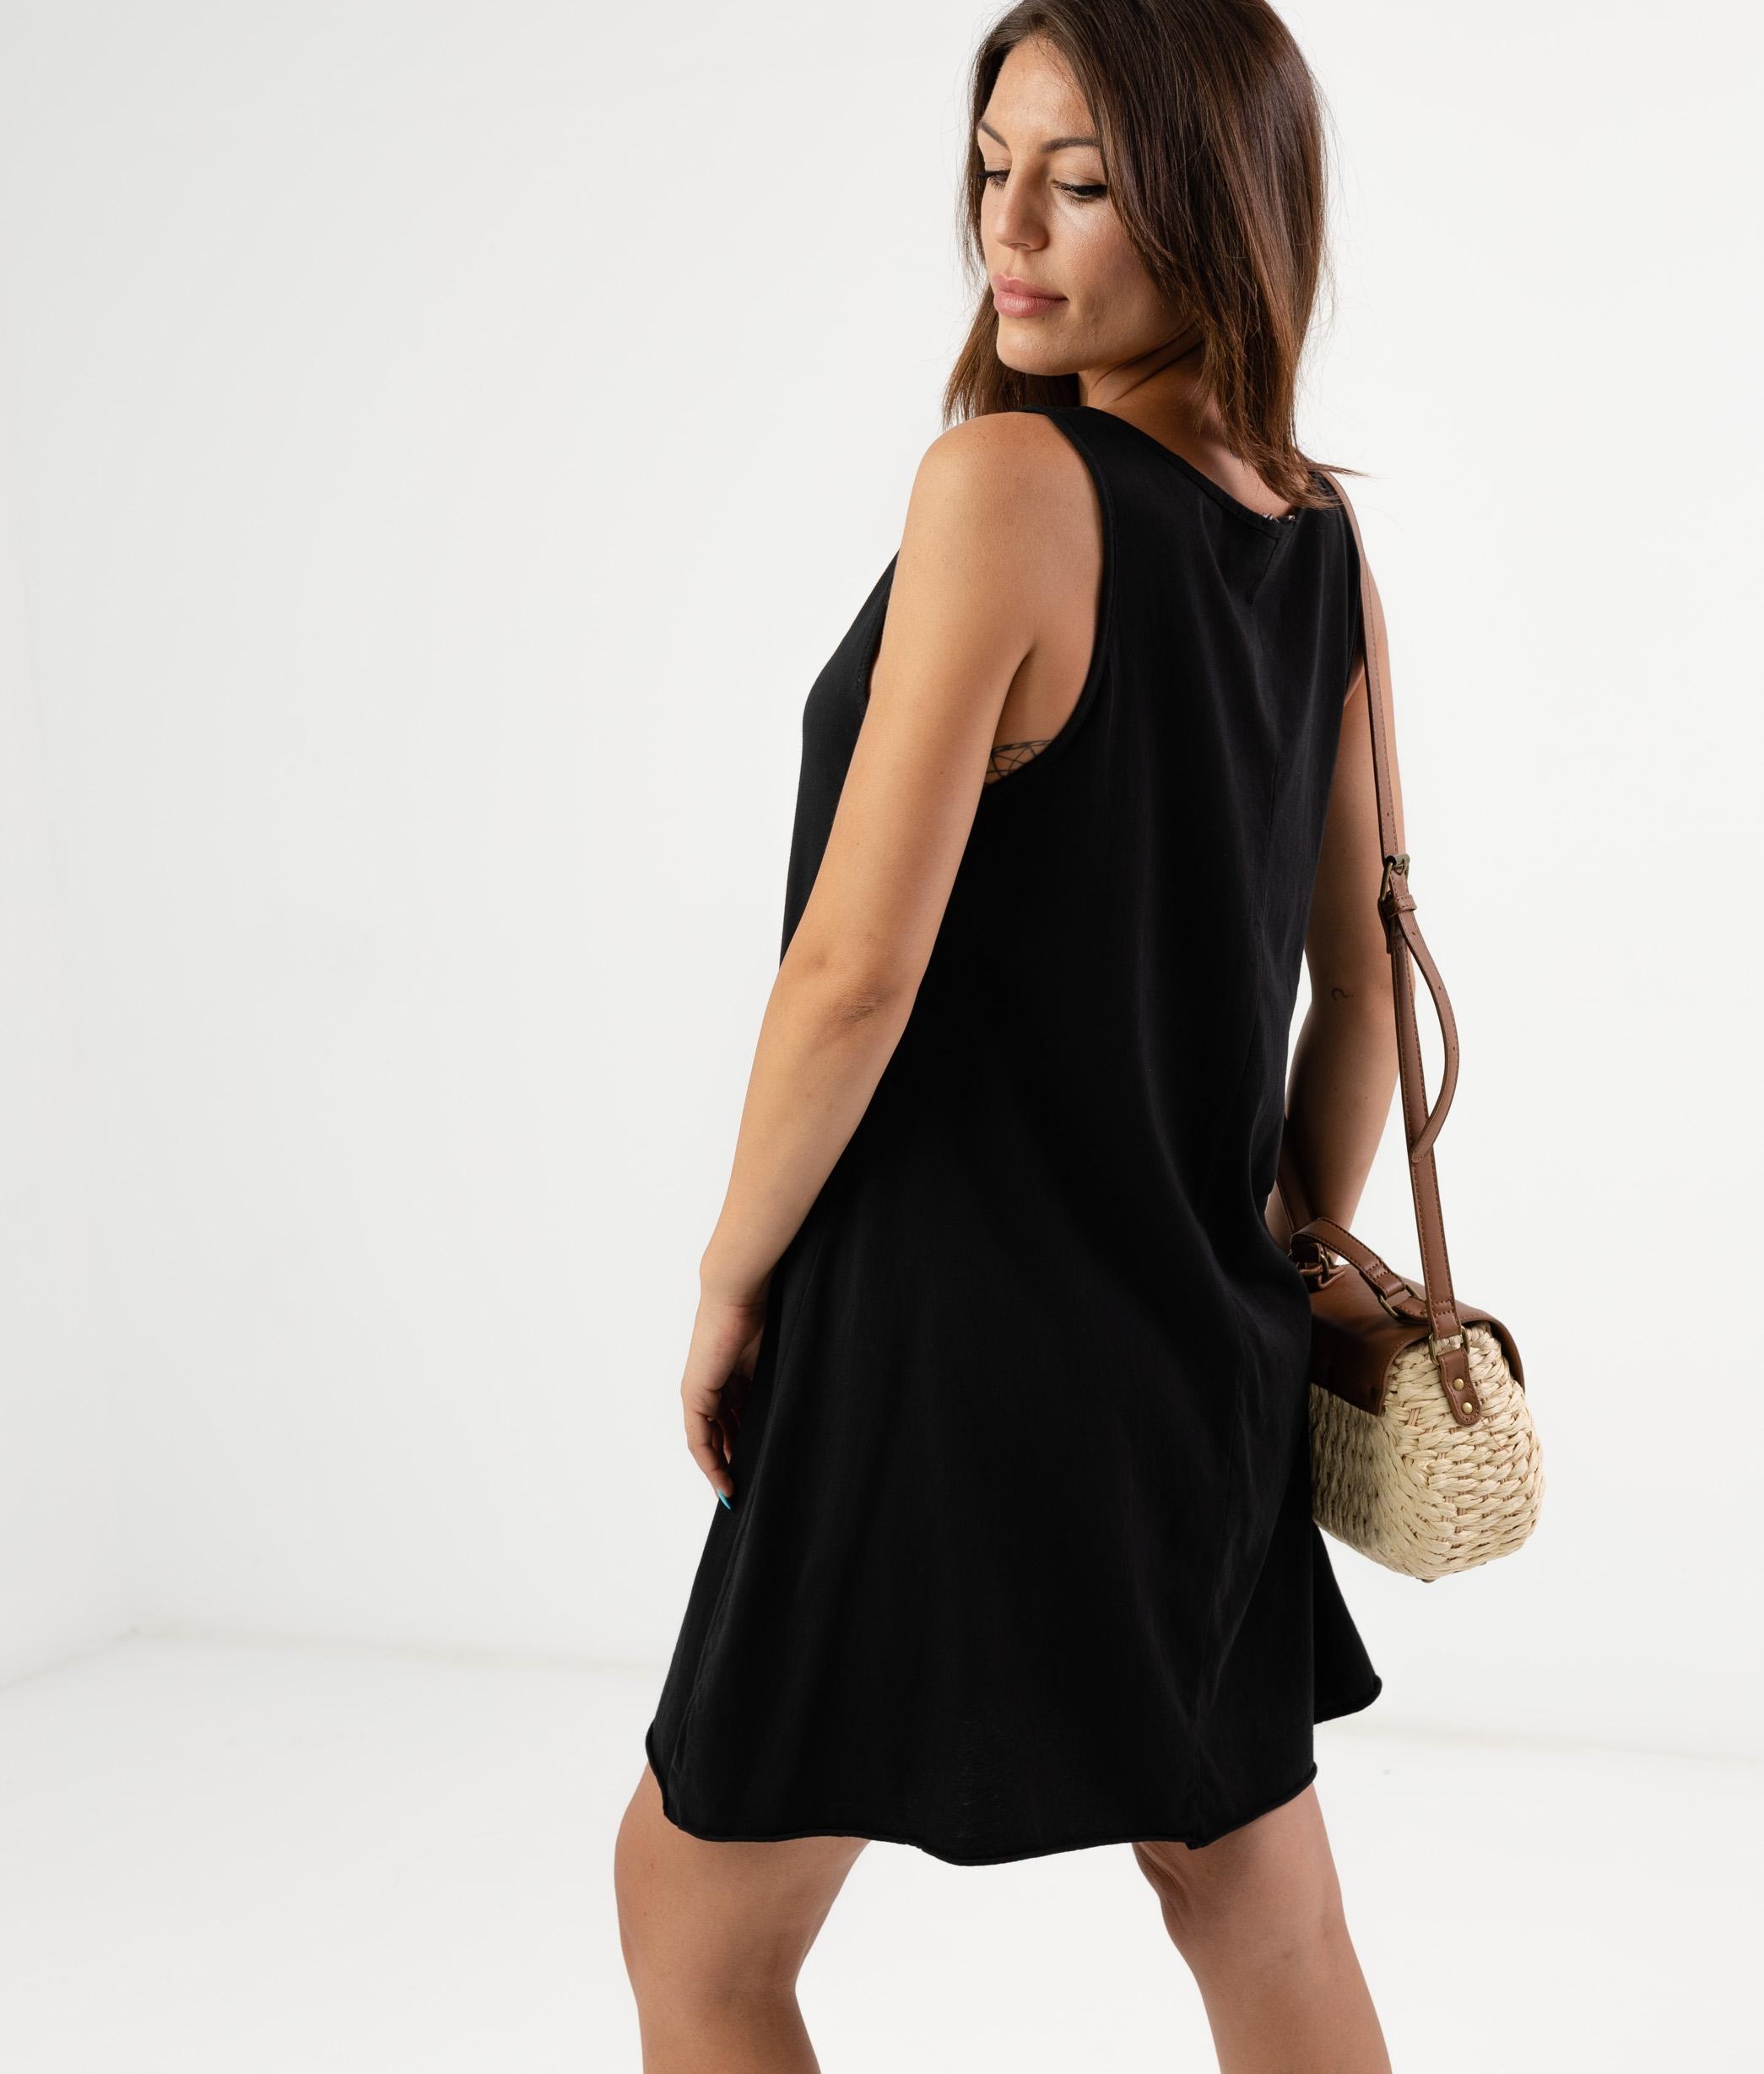 MENDRE DRESS - BLACK